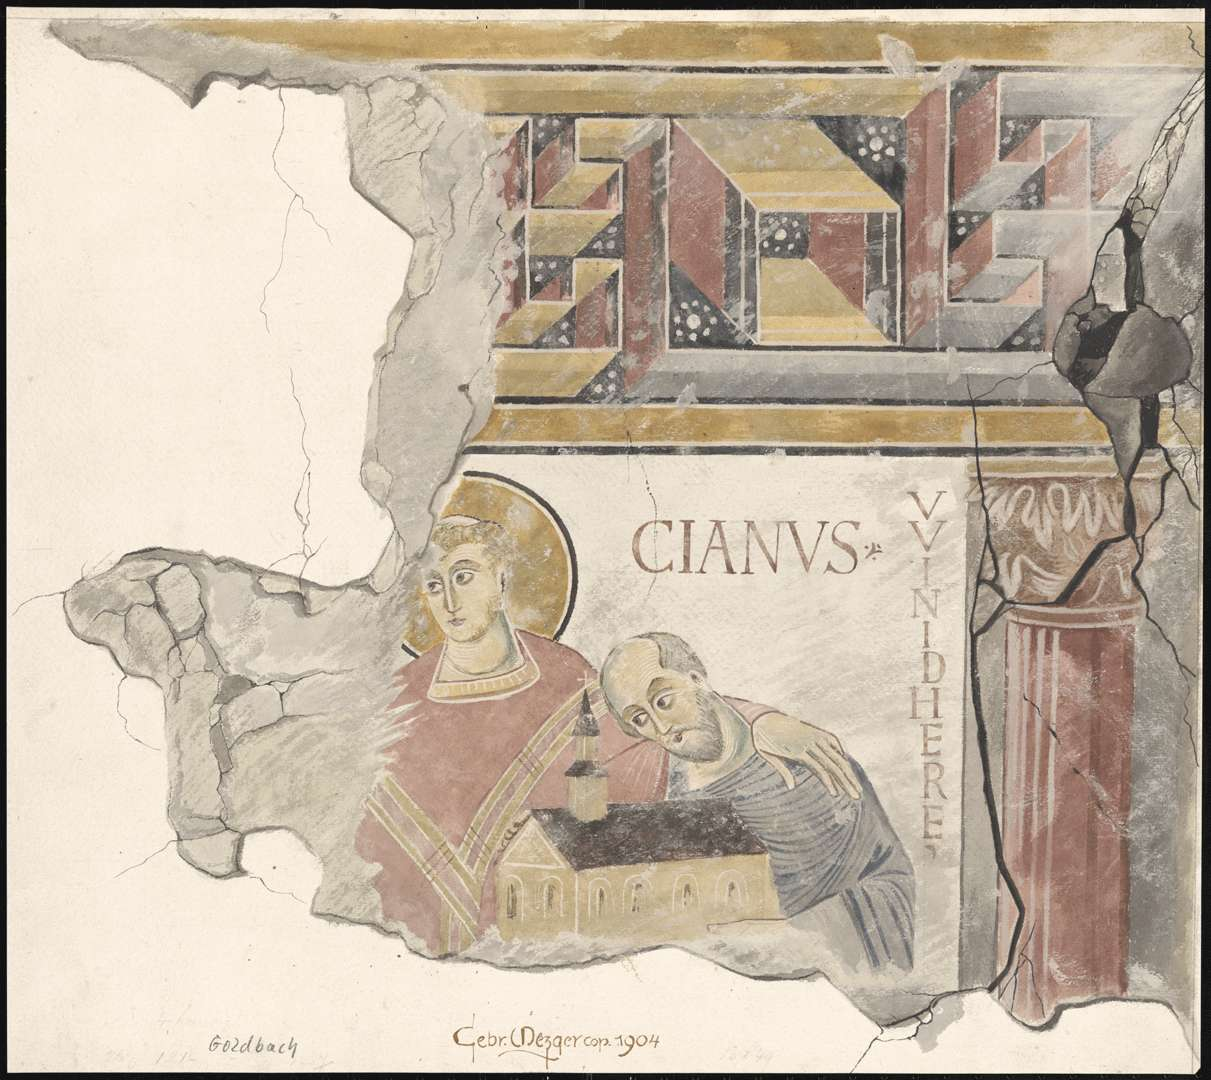 Goldbach St. Sylvester-Kapelle Heiliger Marcianus mit dem Kirchenstifter VVINIDHERE auf der Ostwand des Kirchenschiffes, Bild 1